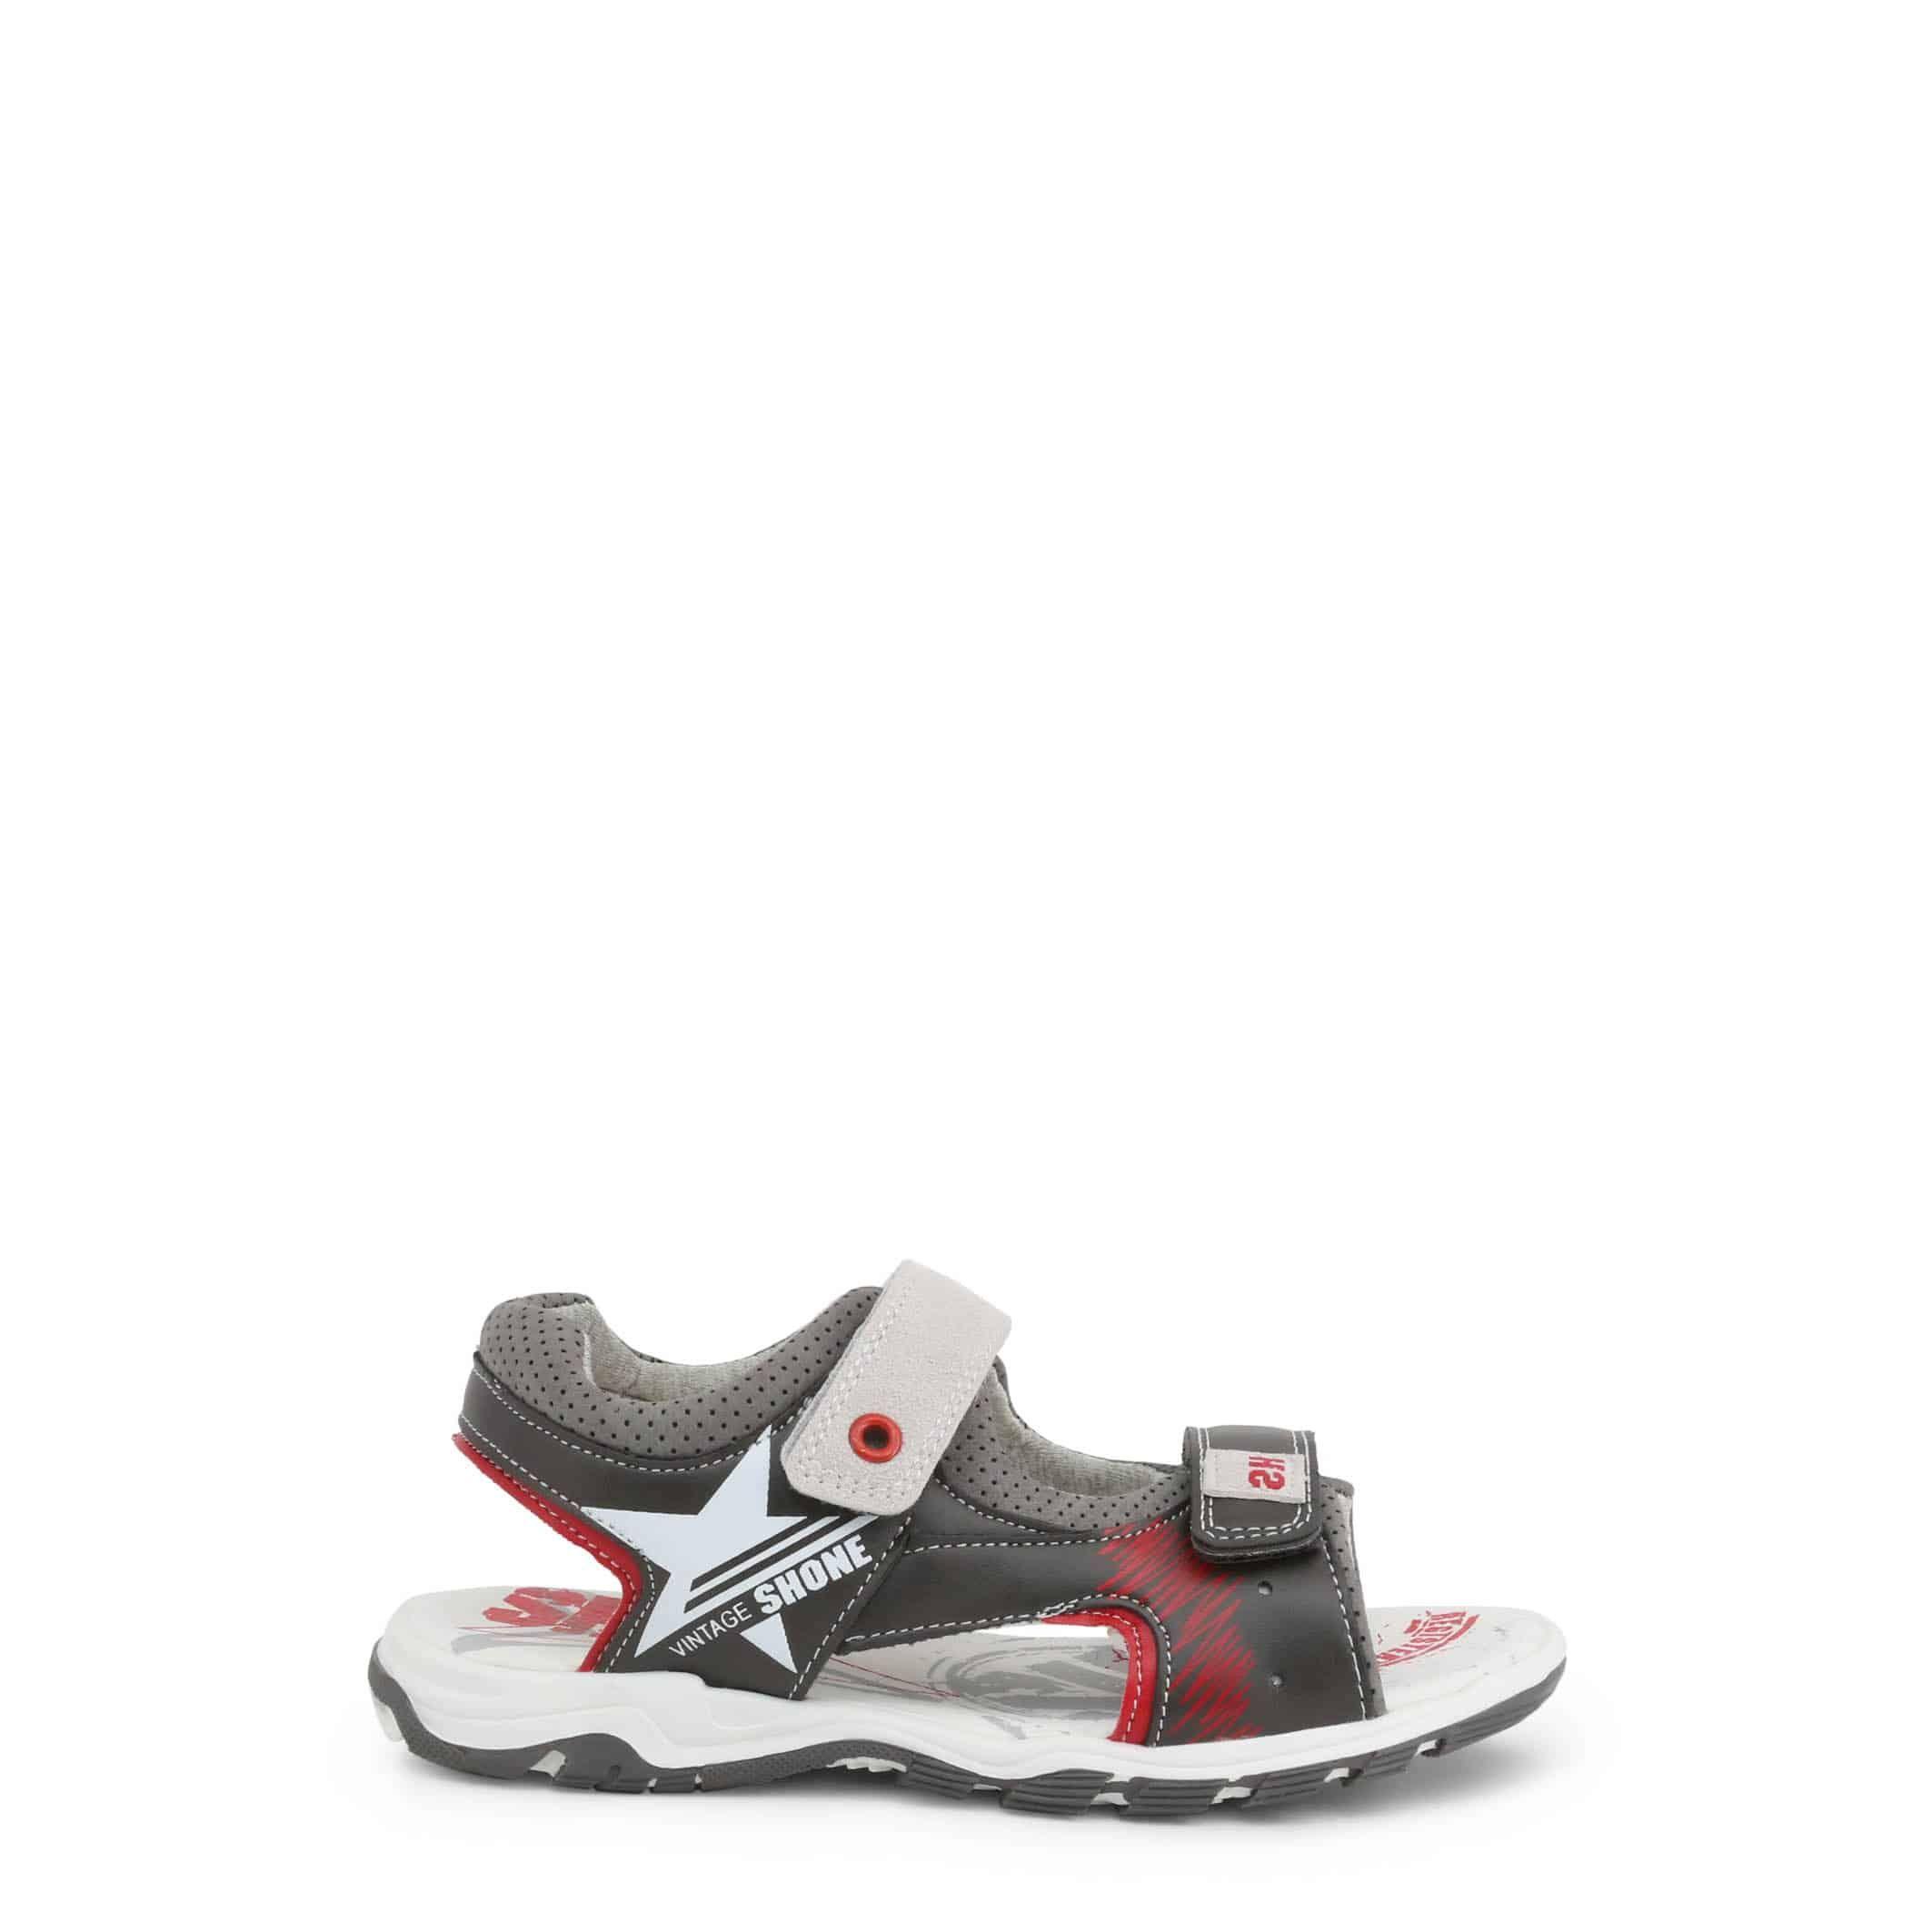 Schuhe R21 – ROCCO_221_PELLE – Braun